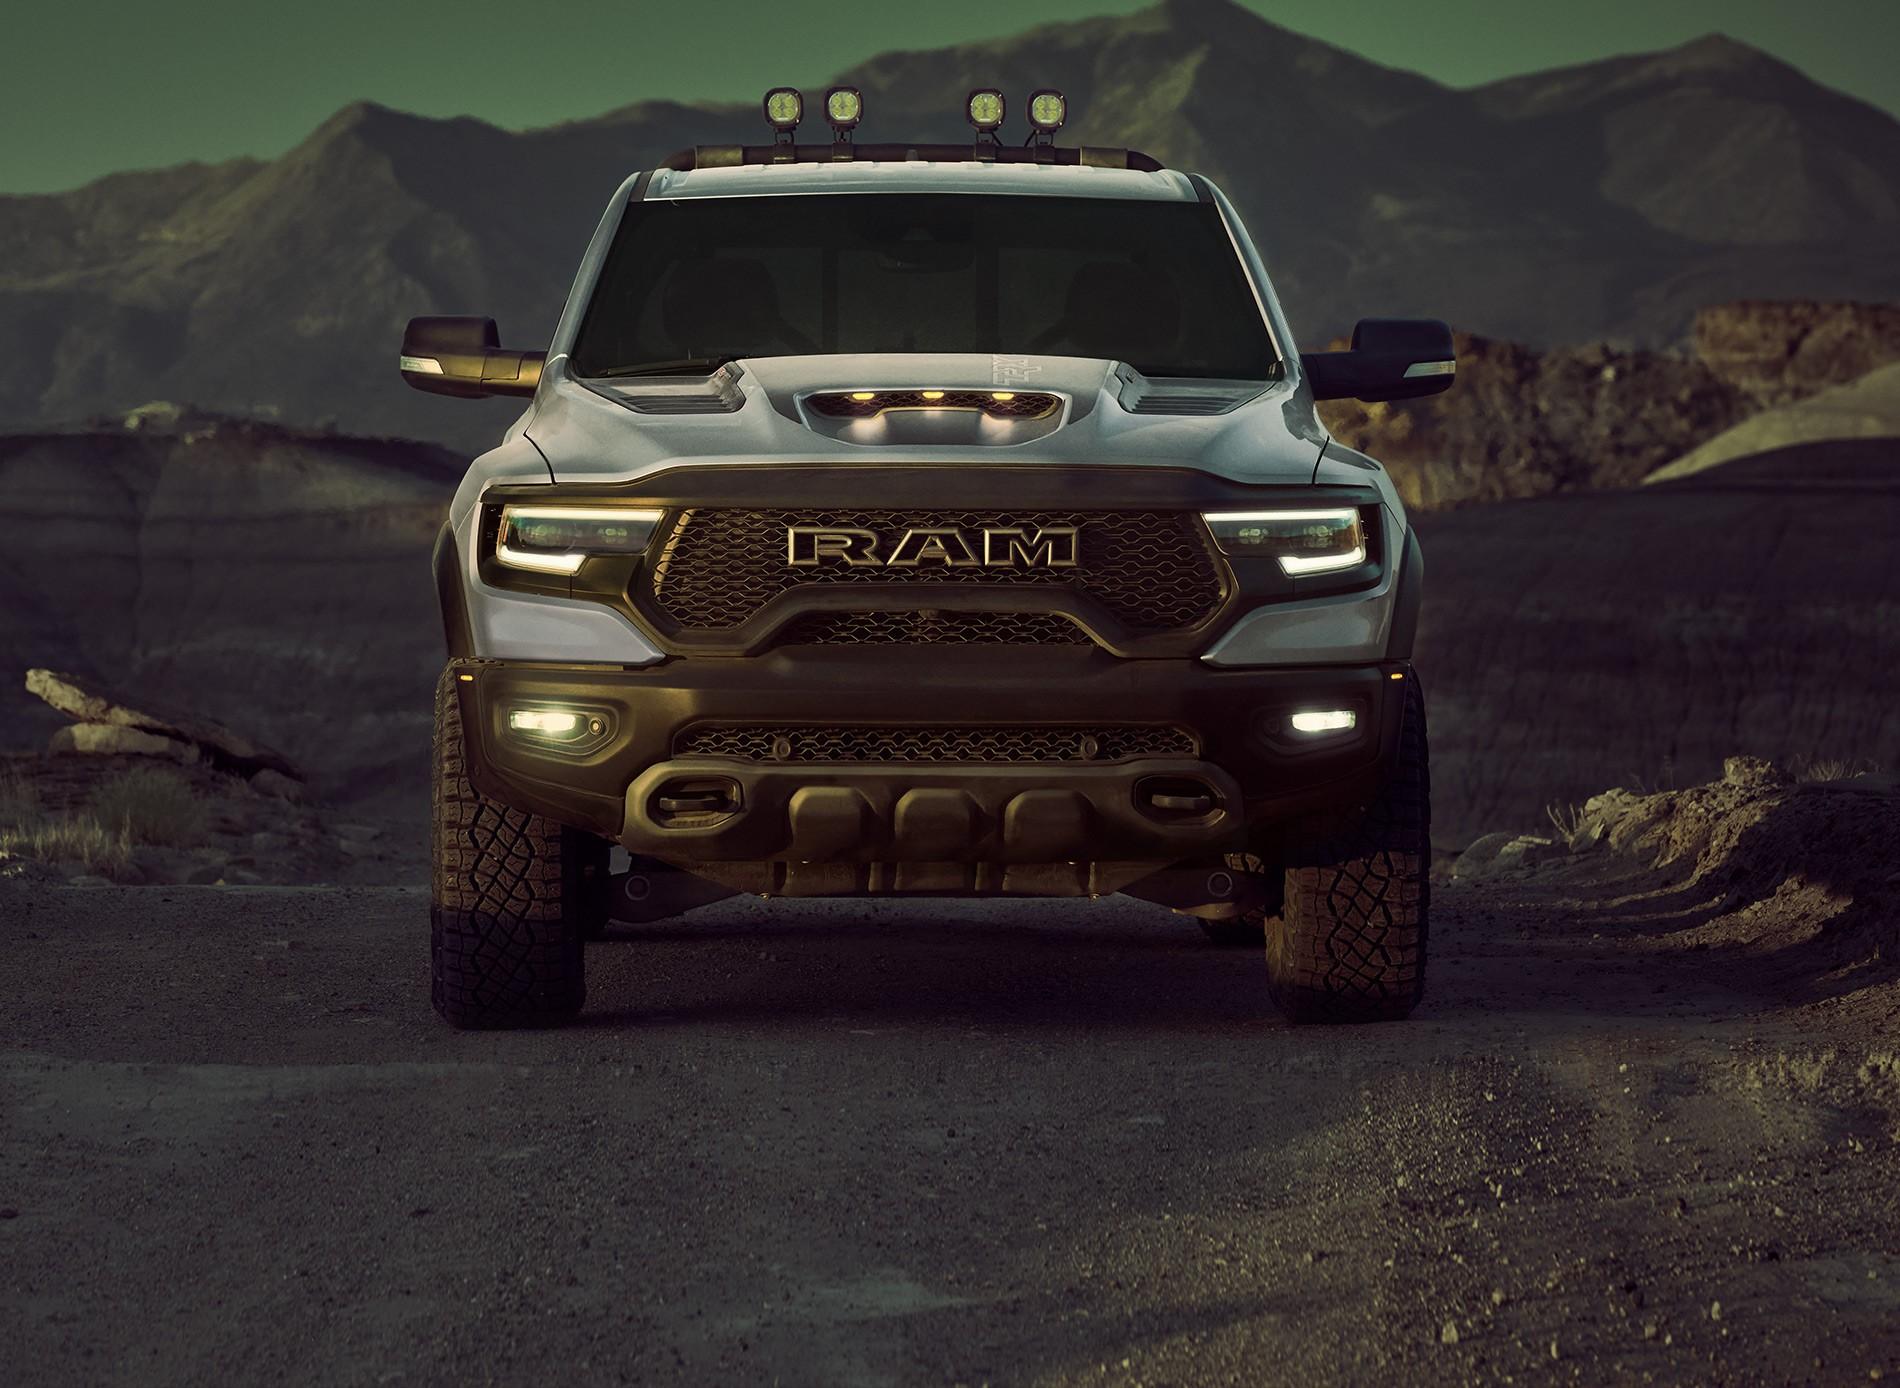 2021 RAM 1500 TRX at Ponoka Chrysler Dodge Jeep Ram